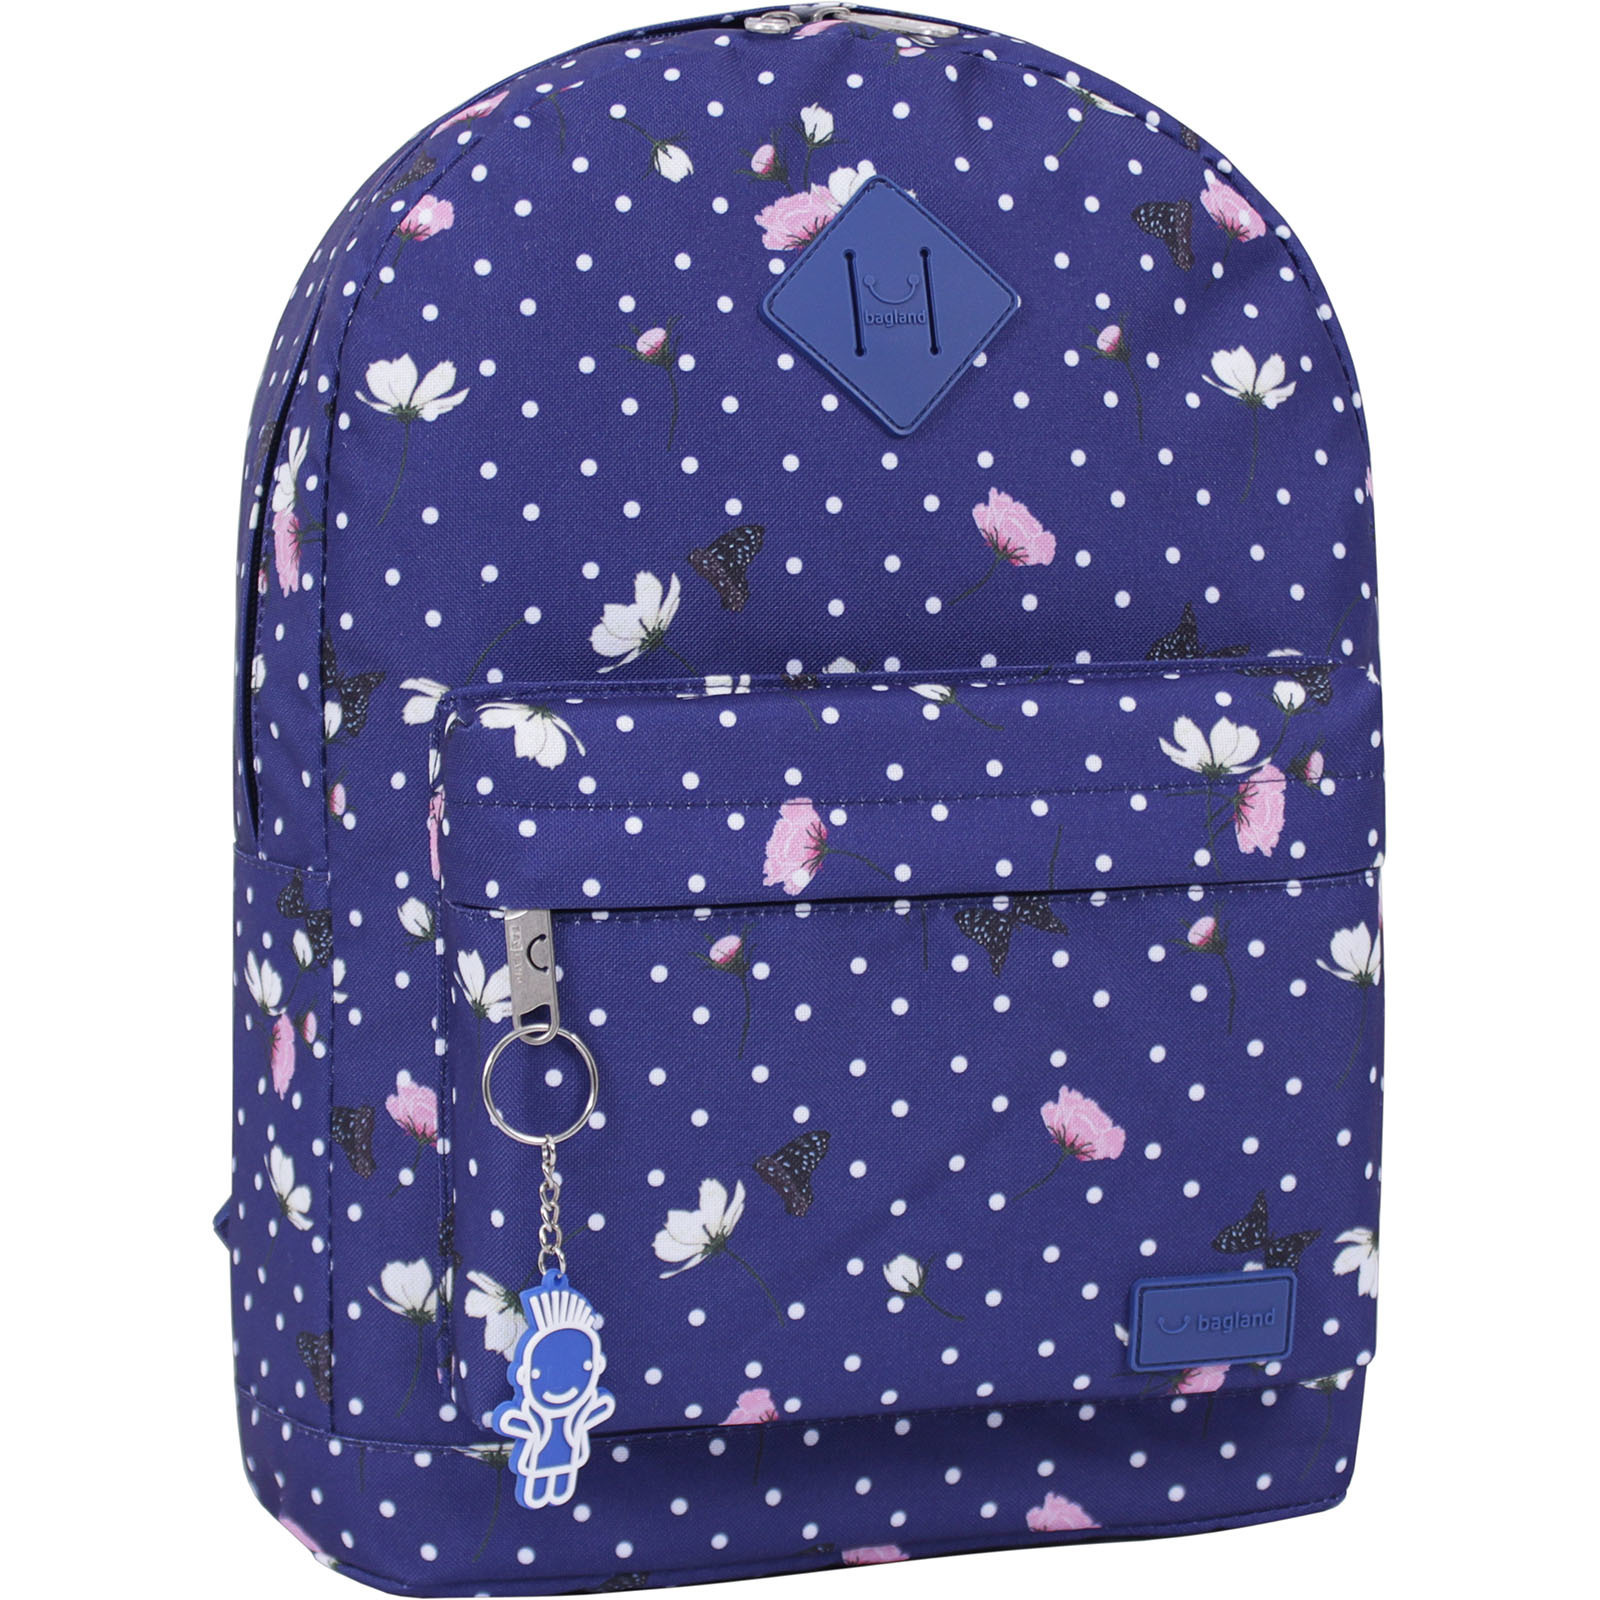 Молодежные рюкзаки Рюкзак Bagland Молодежный 17 л. сублимация 472 (00533664) IMG_9335_суб.472_.JPG